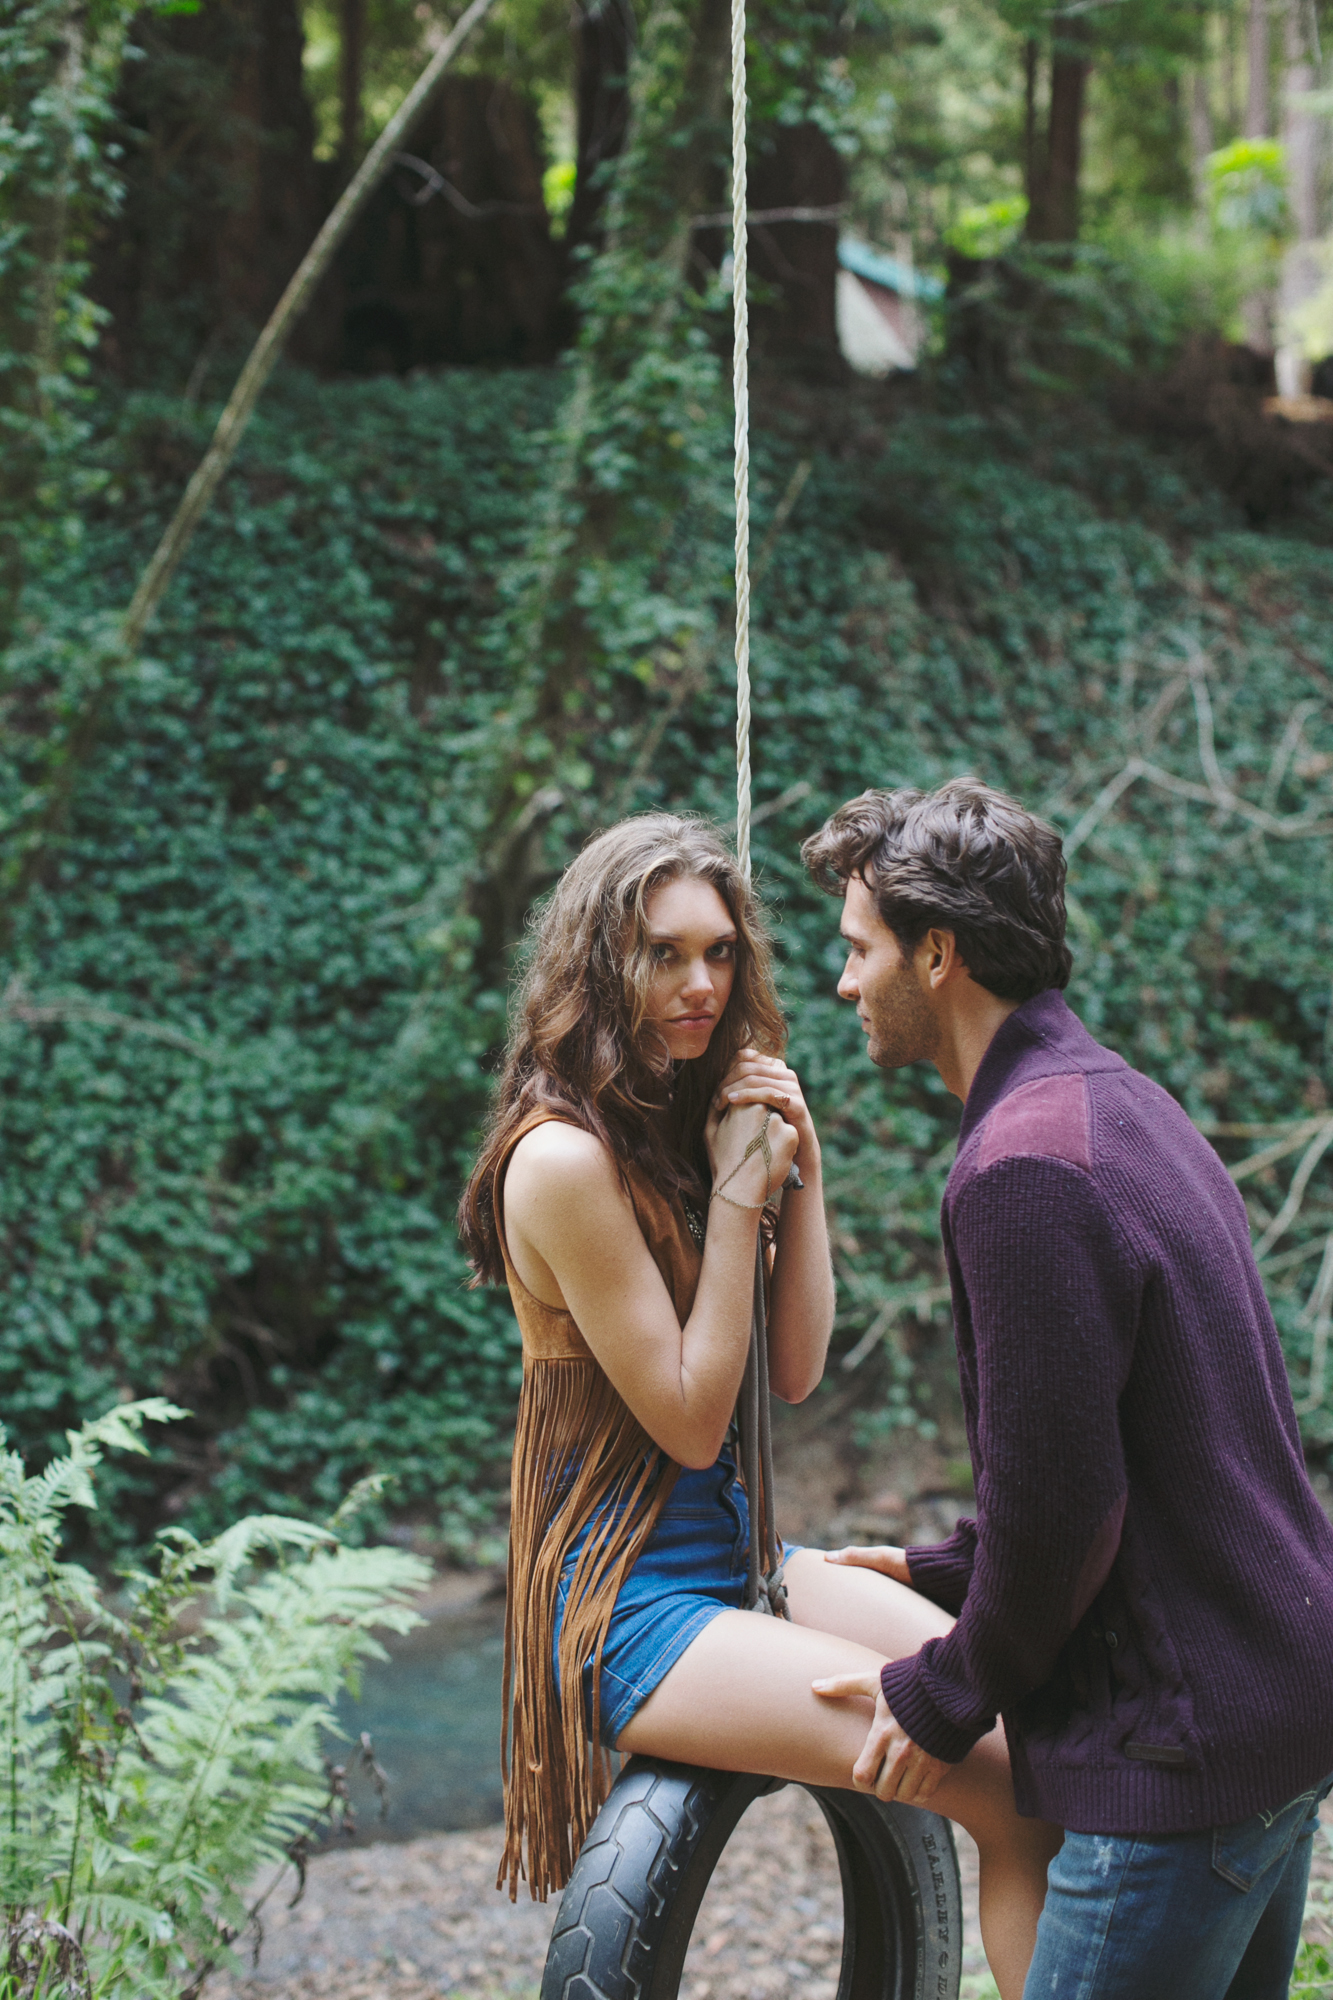 Fashion Photographer, Jennifer Skog's seductive version of Cabin Fever